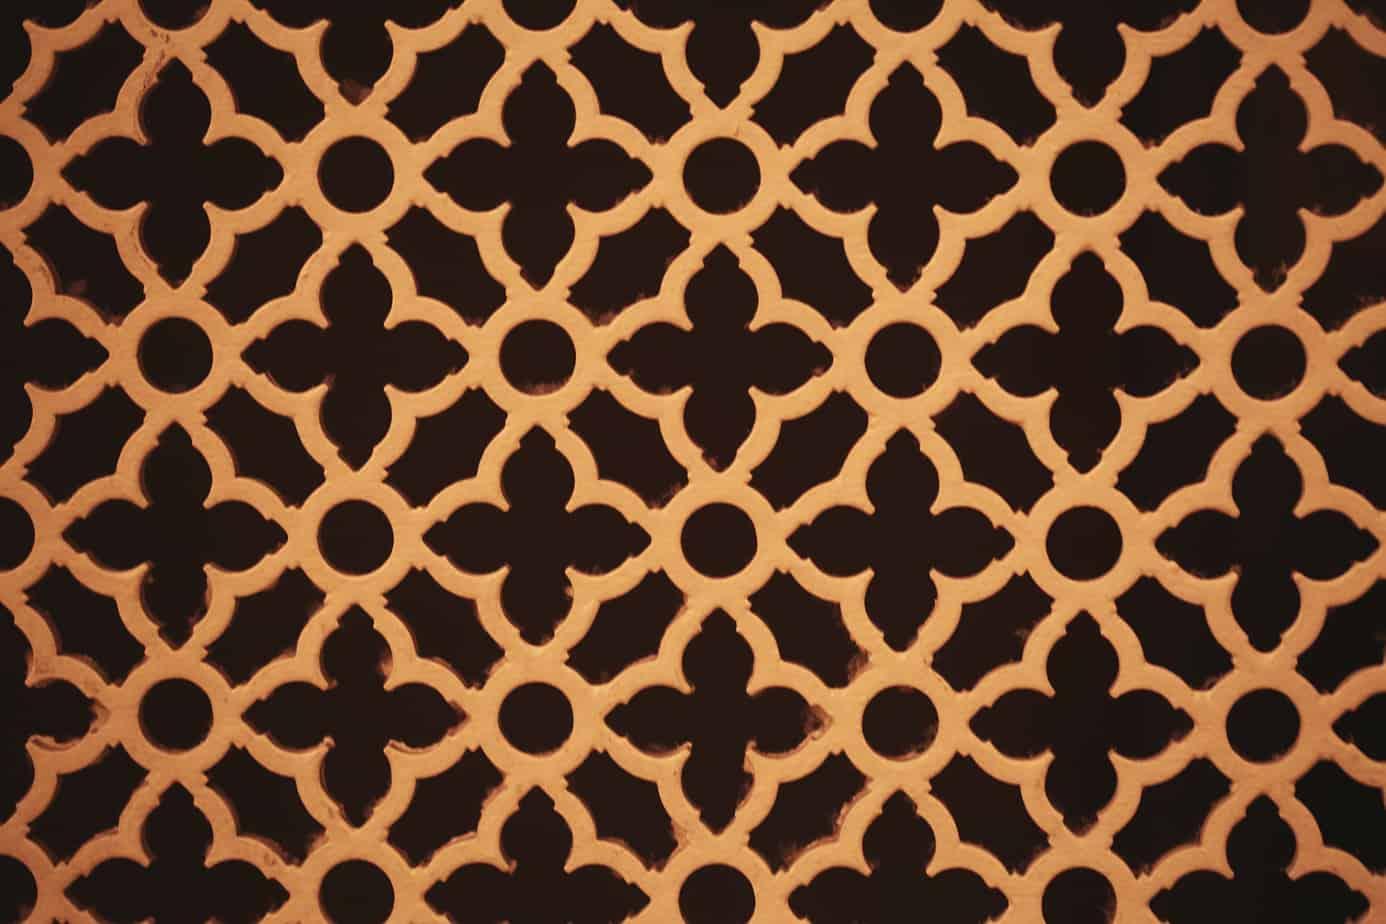 9-Life-of-Pix-free-stock-photos-pattern-new-york-gold-texture